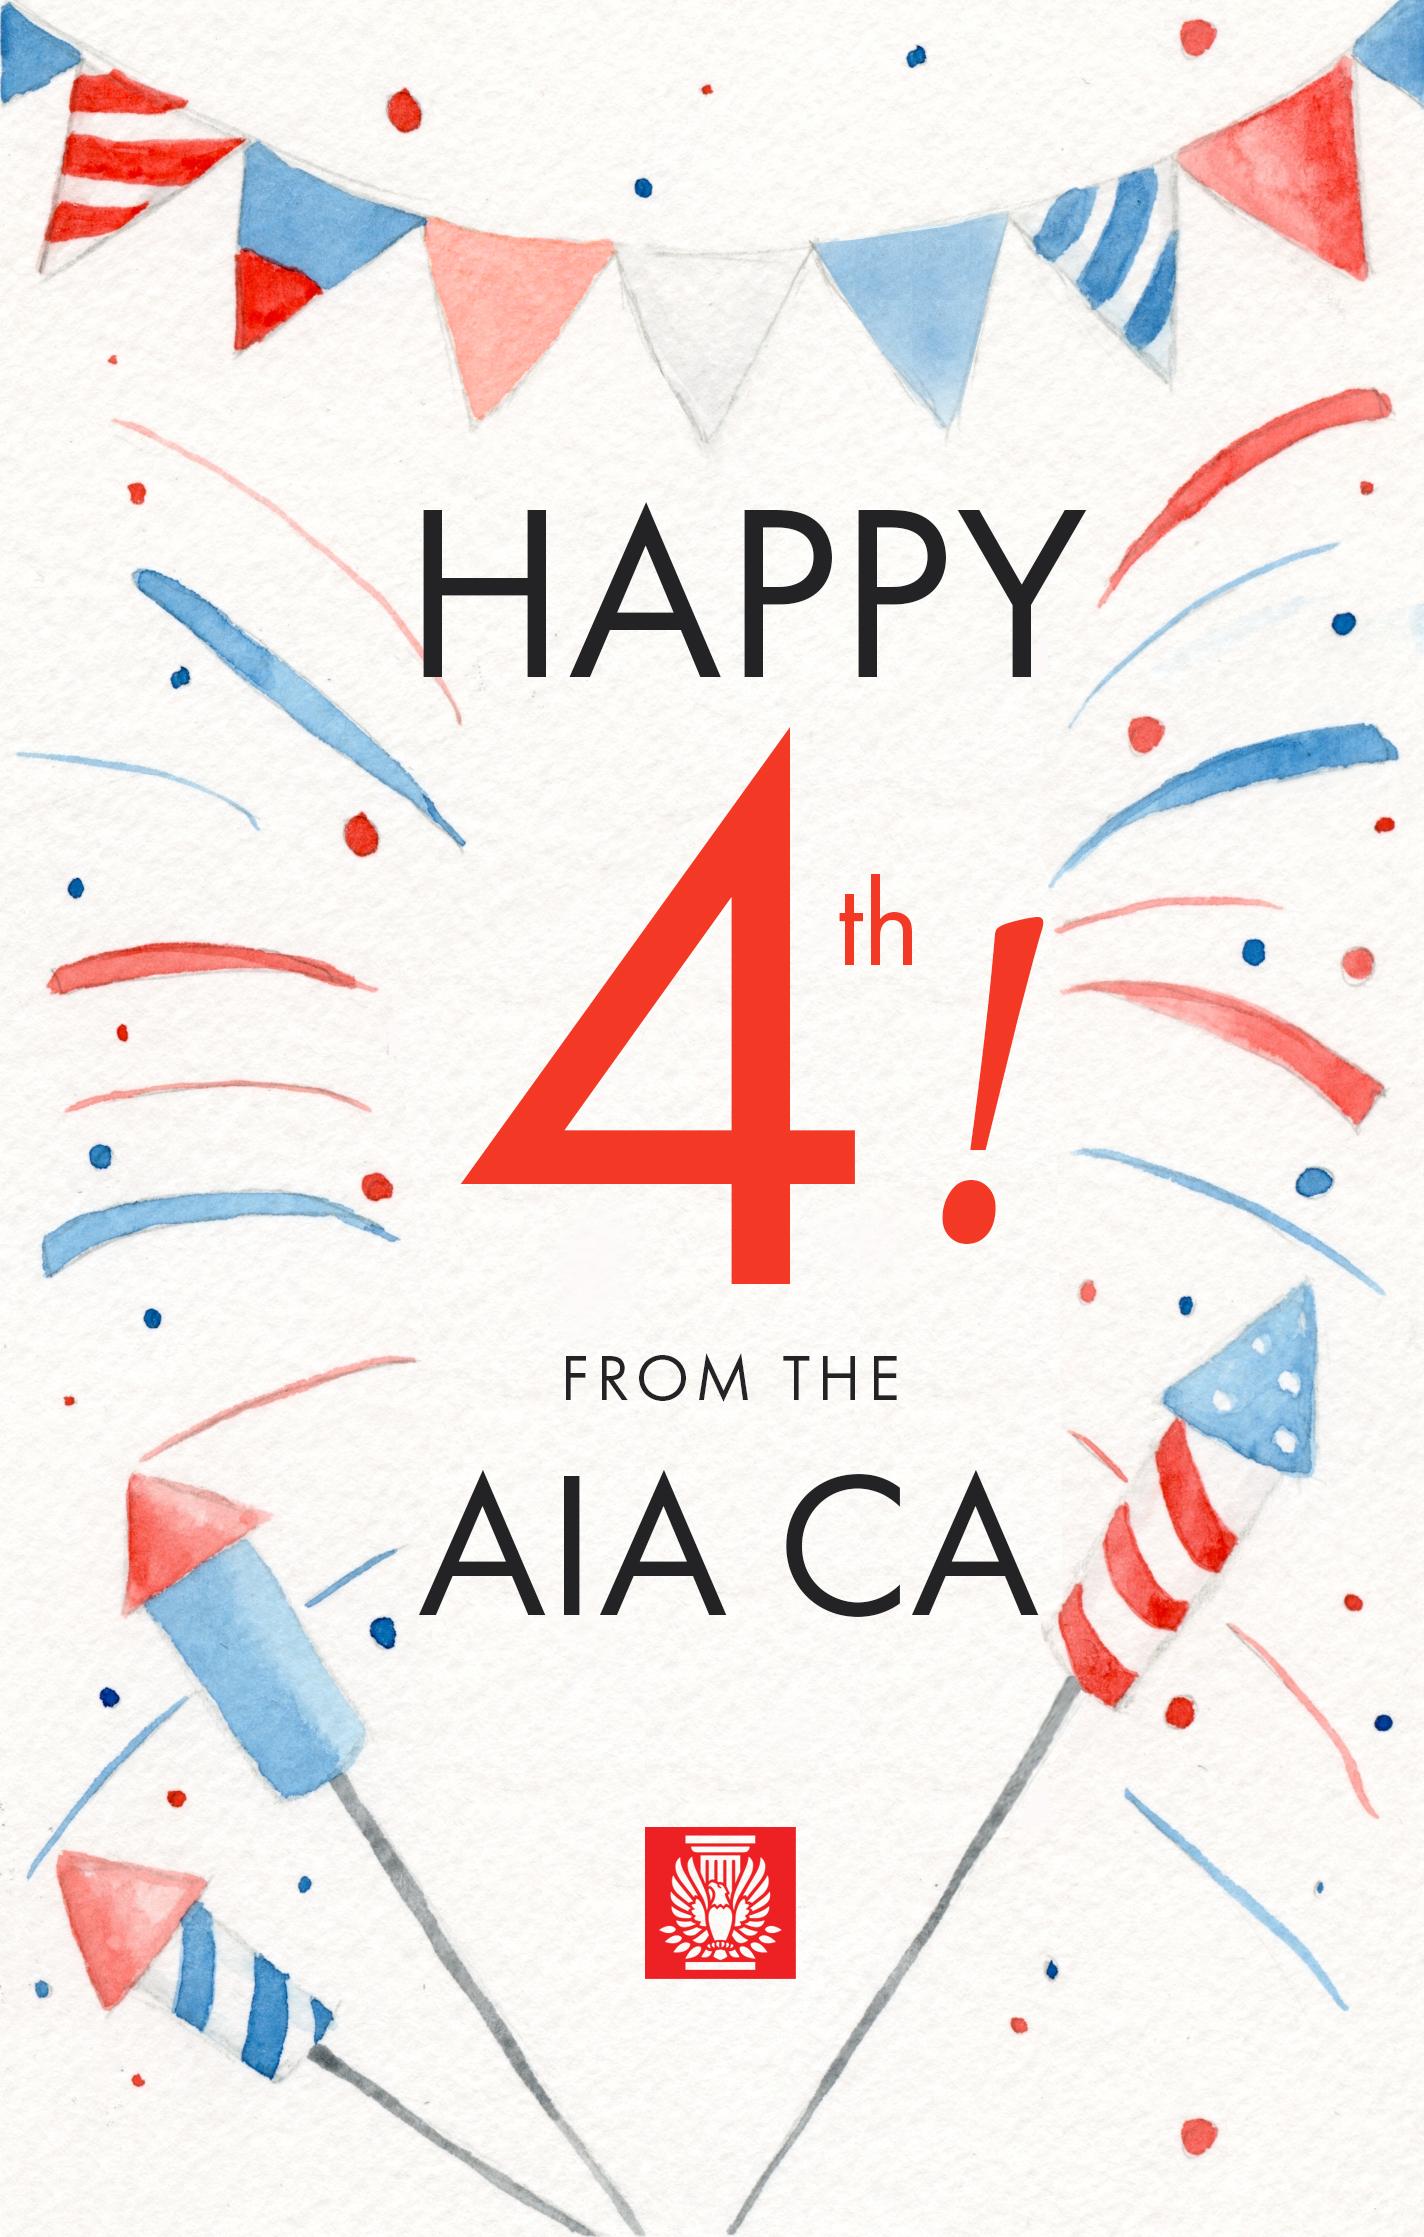 AIACA-4th